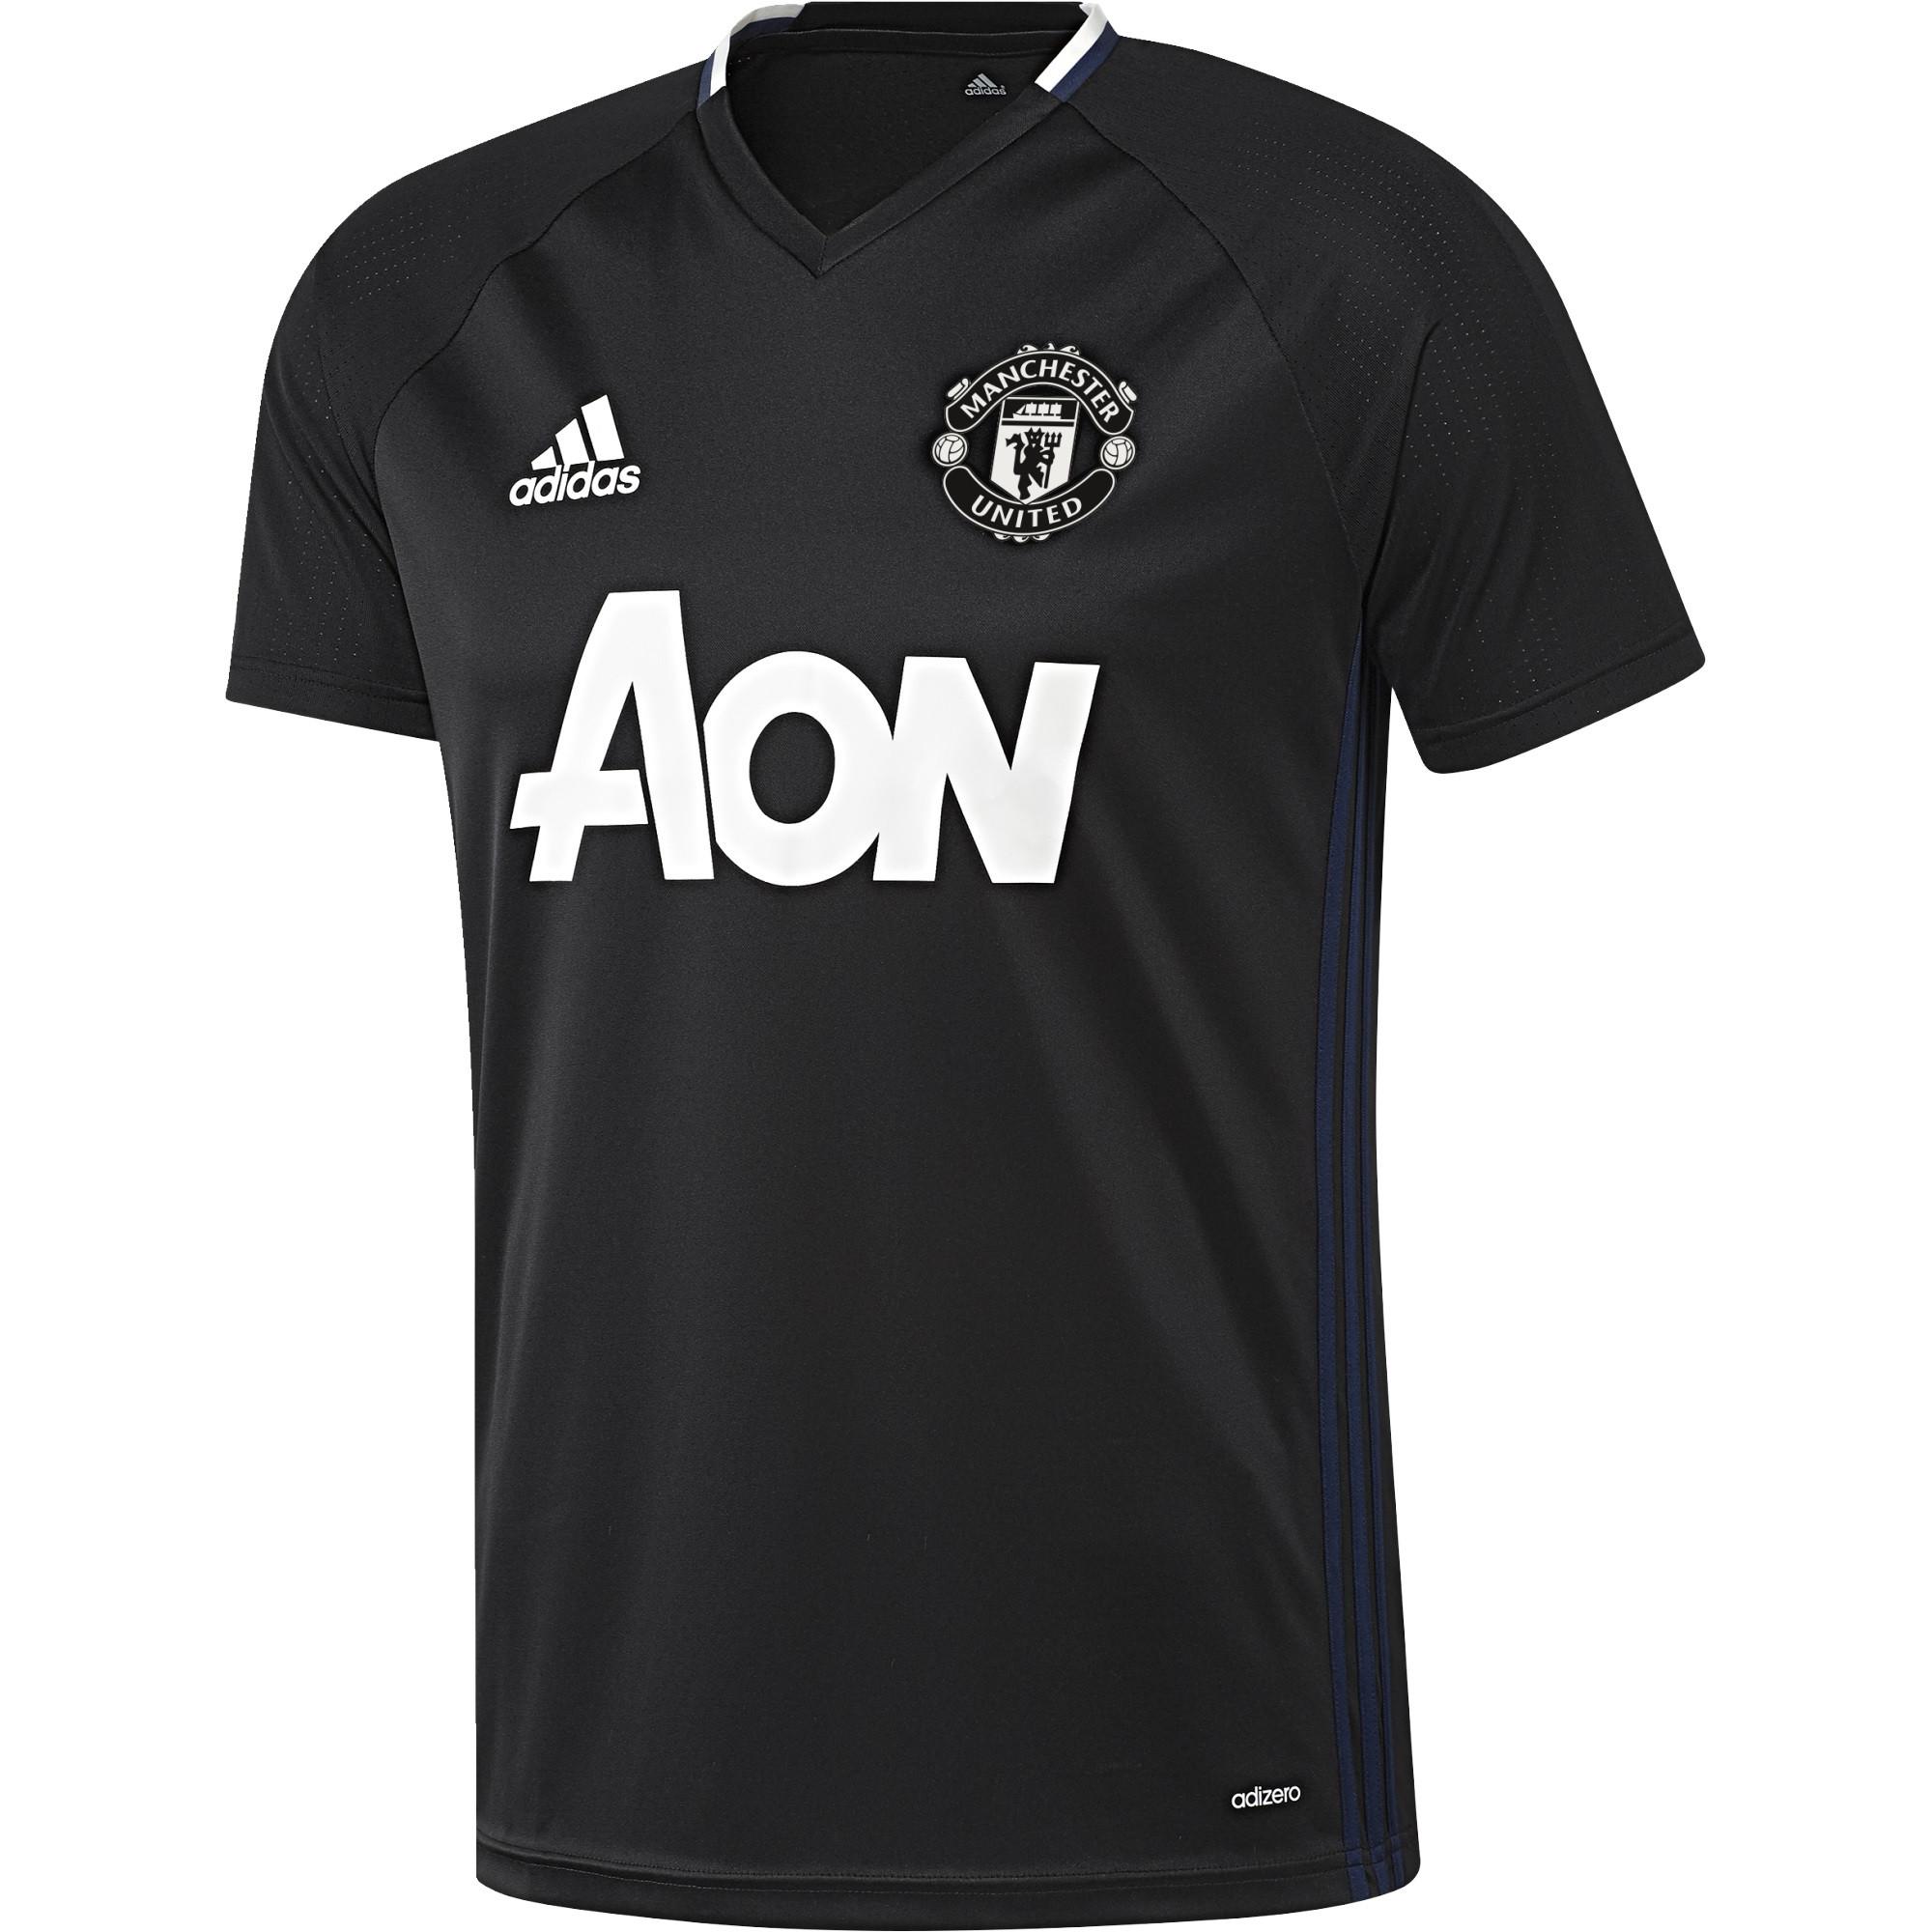 adidas manchester united maillot entrainement noir 2016 2017 manchester united club etrangers. Black Bedroom Furniture Sets. Home Design Ideas